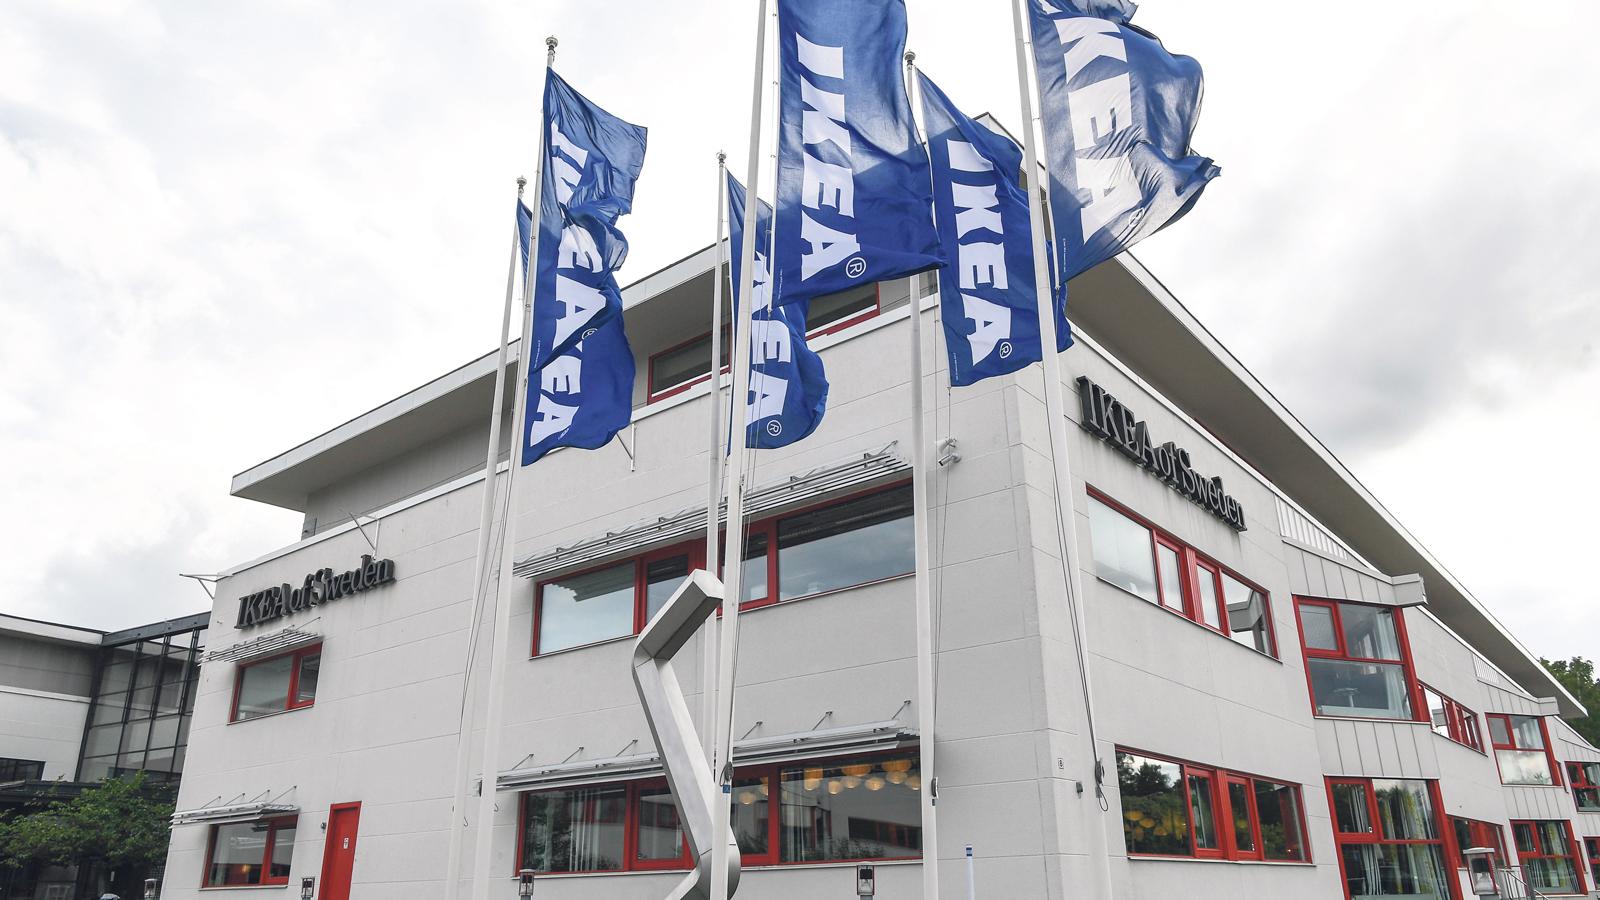 Ikeas dotterbolag i facklig strid